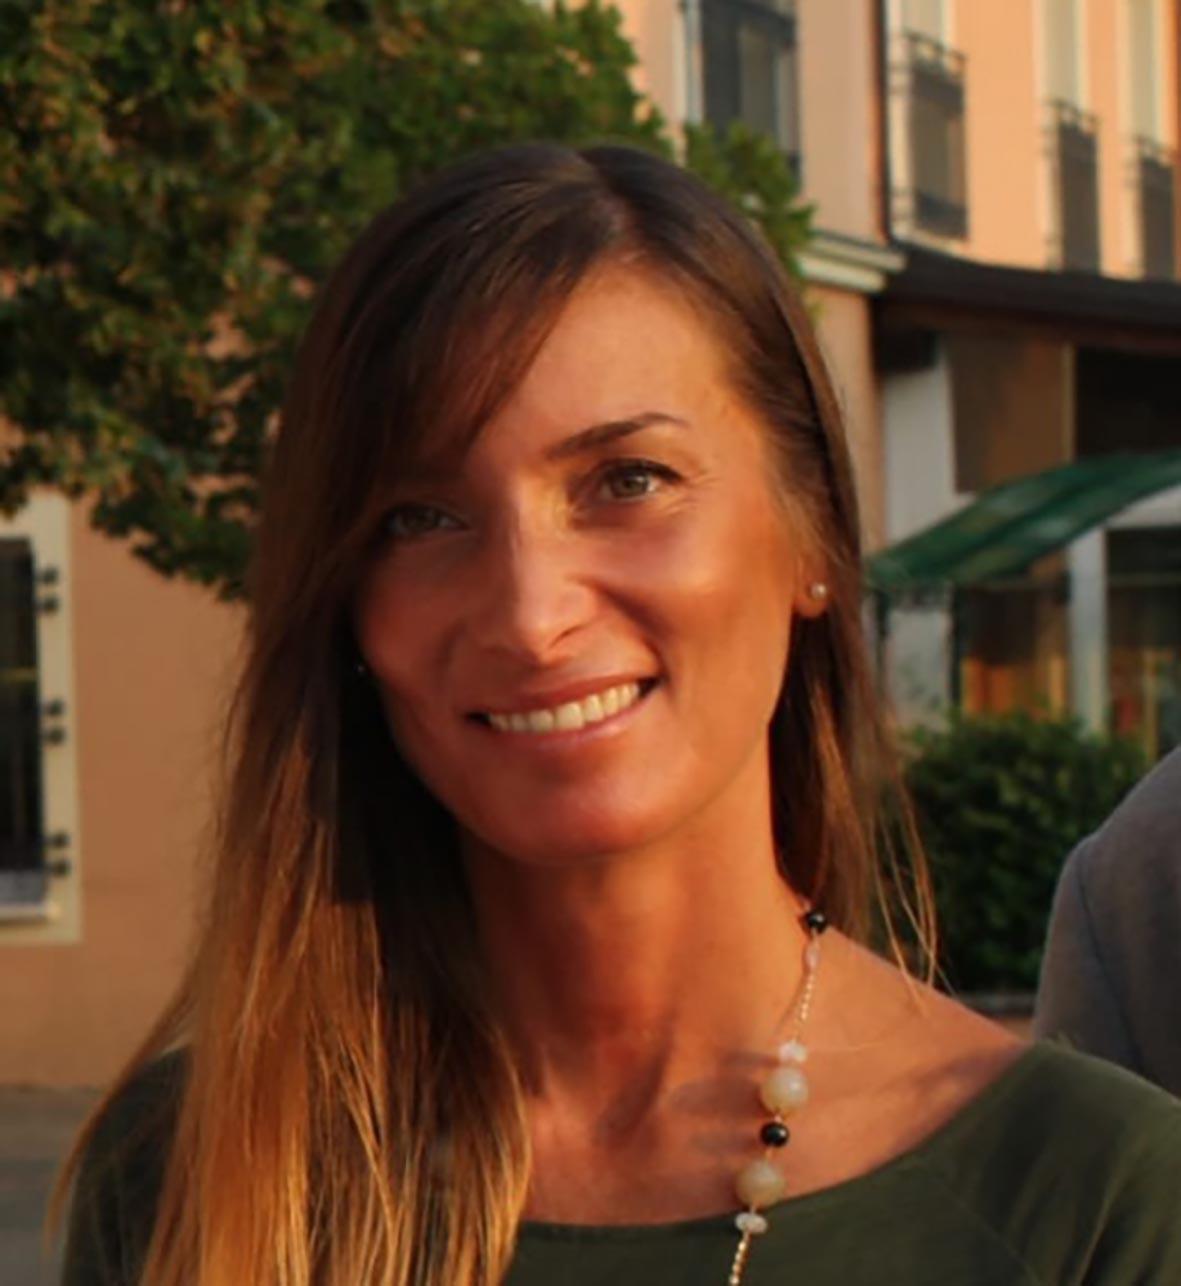 PCL_Chiara Capuccini